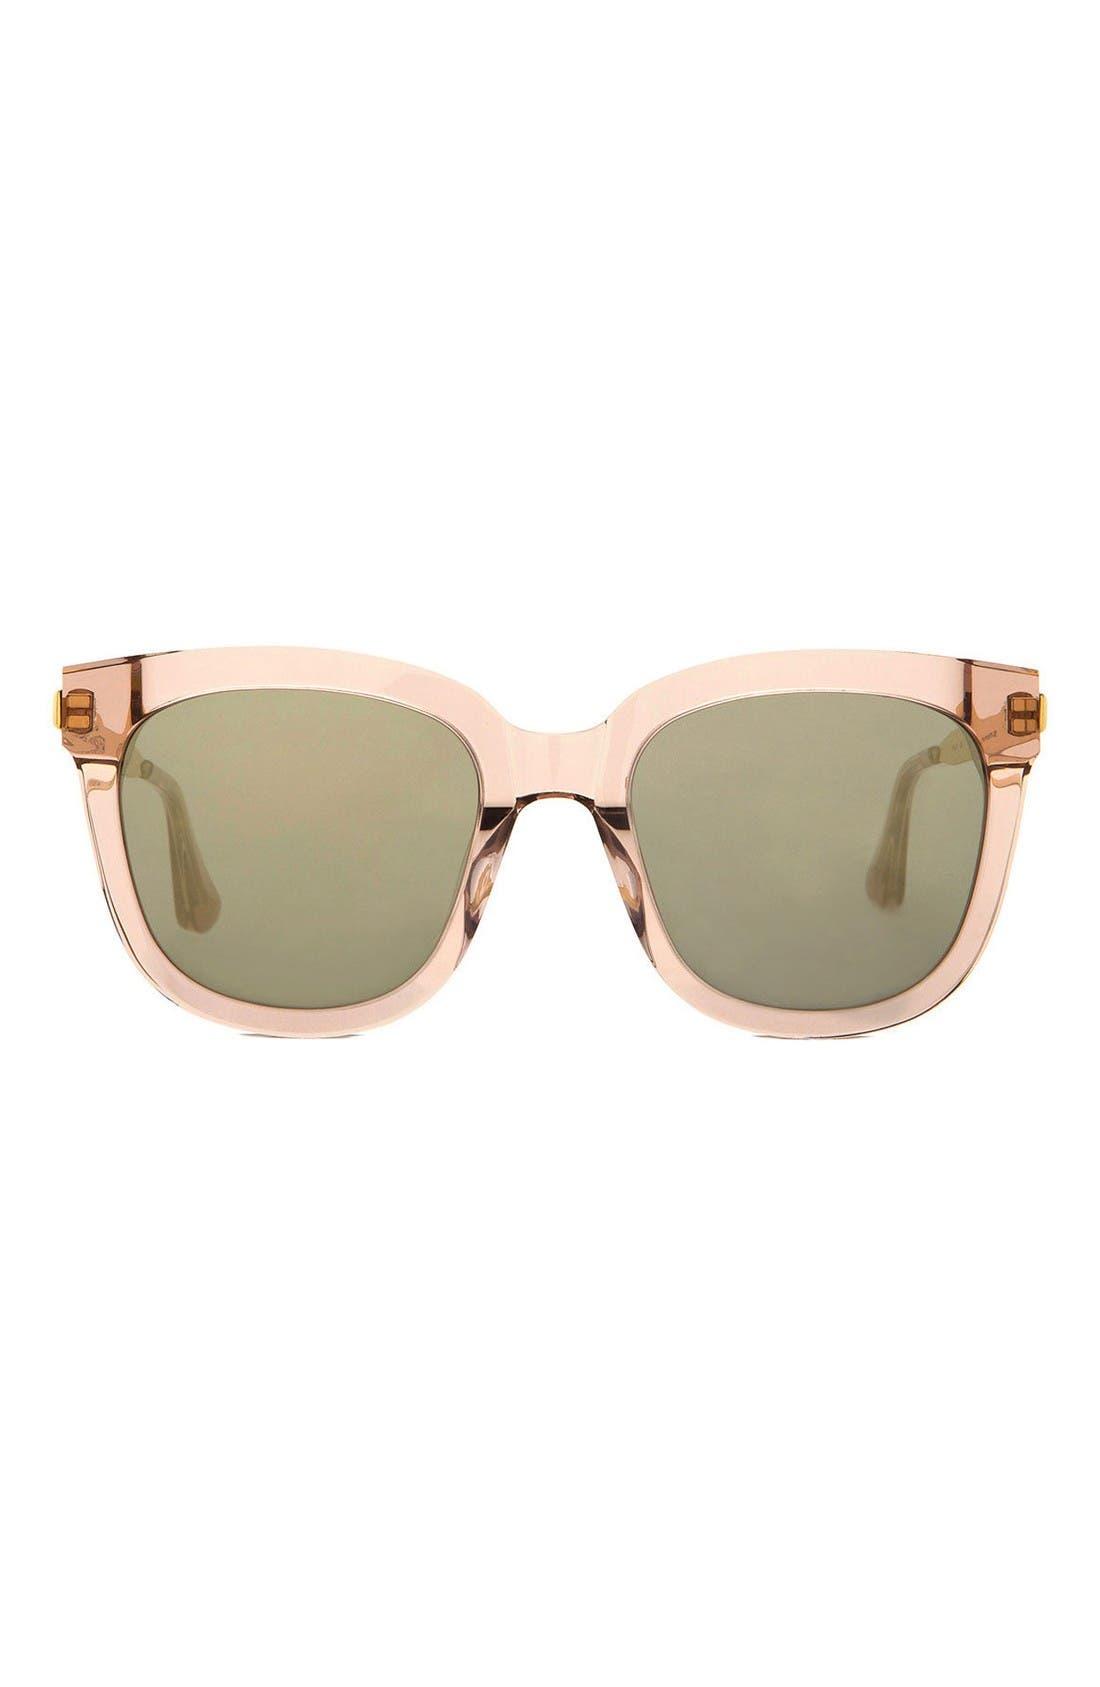 Alternate Image 1 Selected - Gentle Monster Absente 54mm Sunglasses